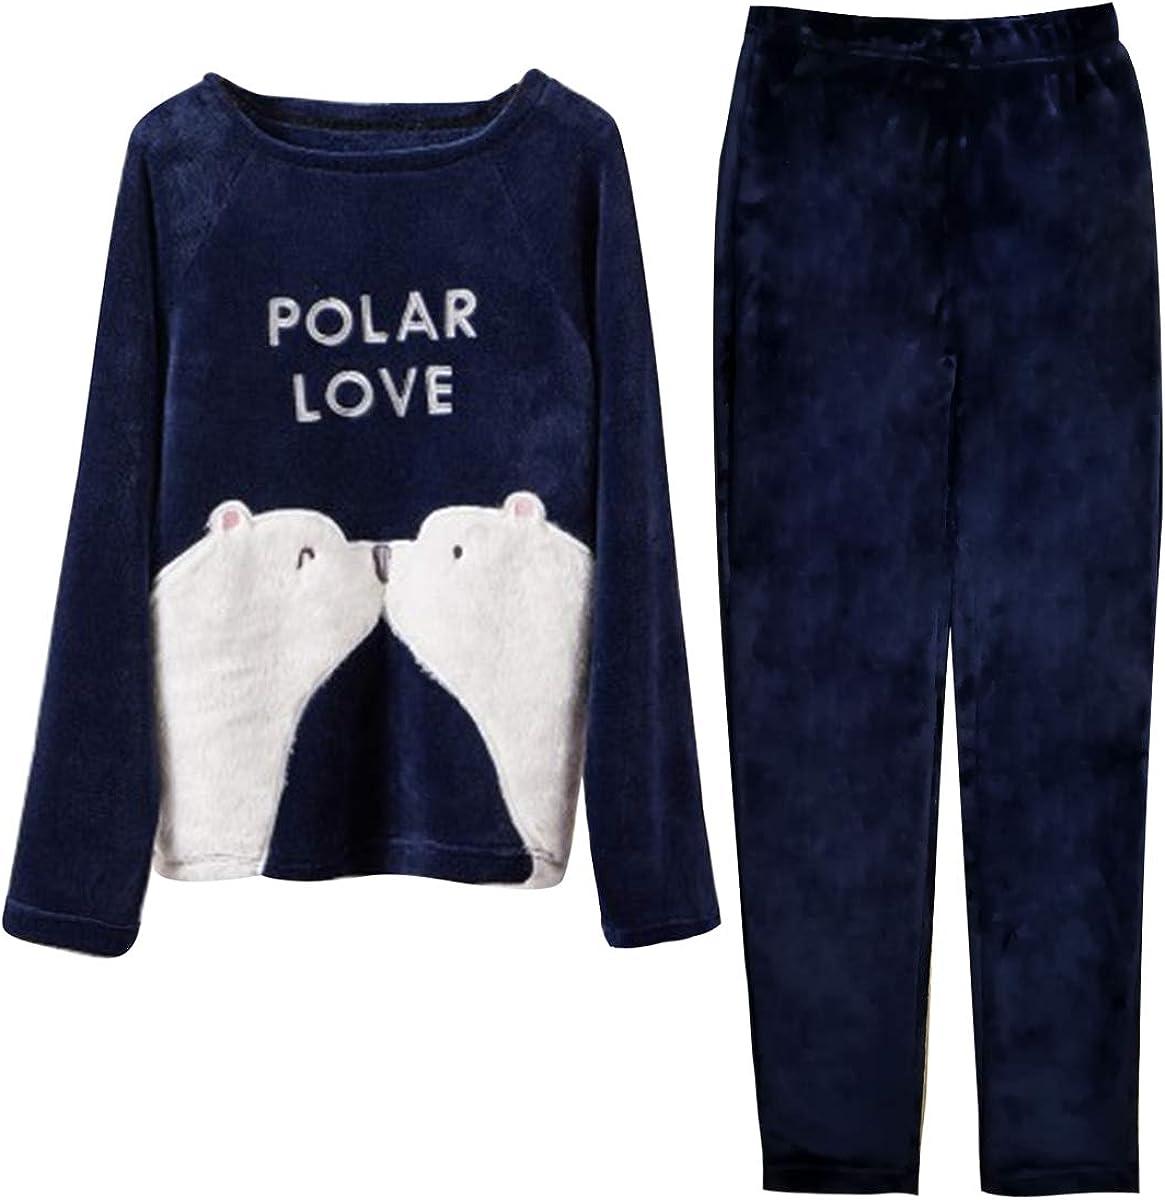 Pigiama invernale caldo per ragazze adolescenti Tween Top e pantaloni lunghi Big Girl Sleepwear GOSO Pigiama da bambina 8 9 10 11 12 13 14 anni